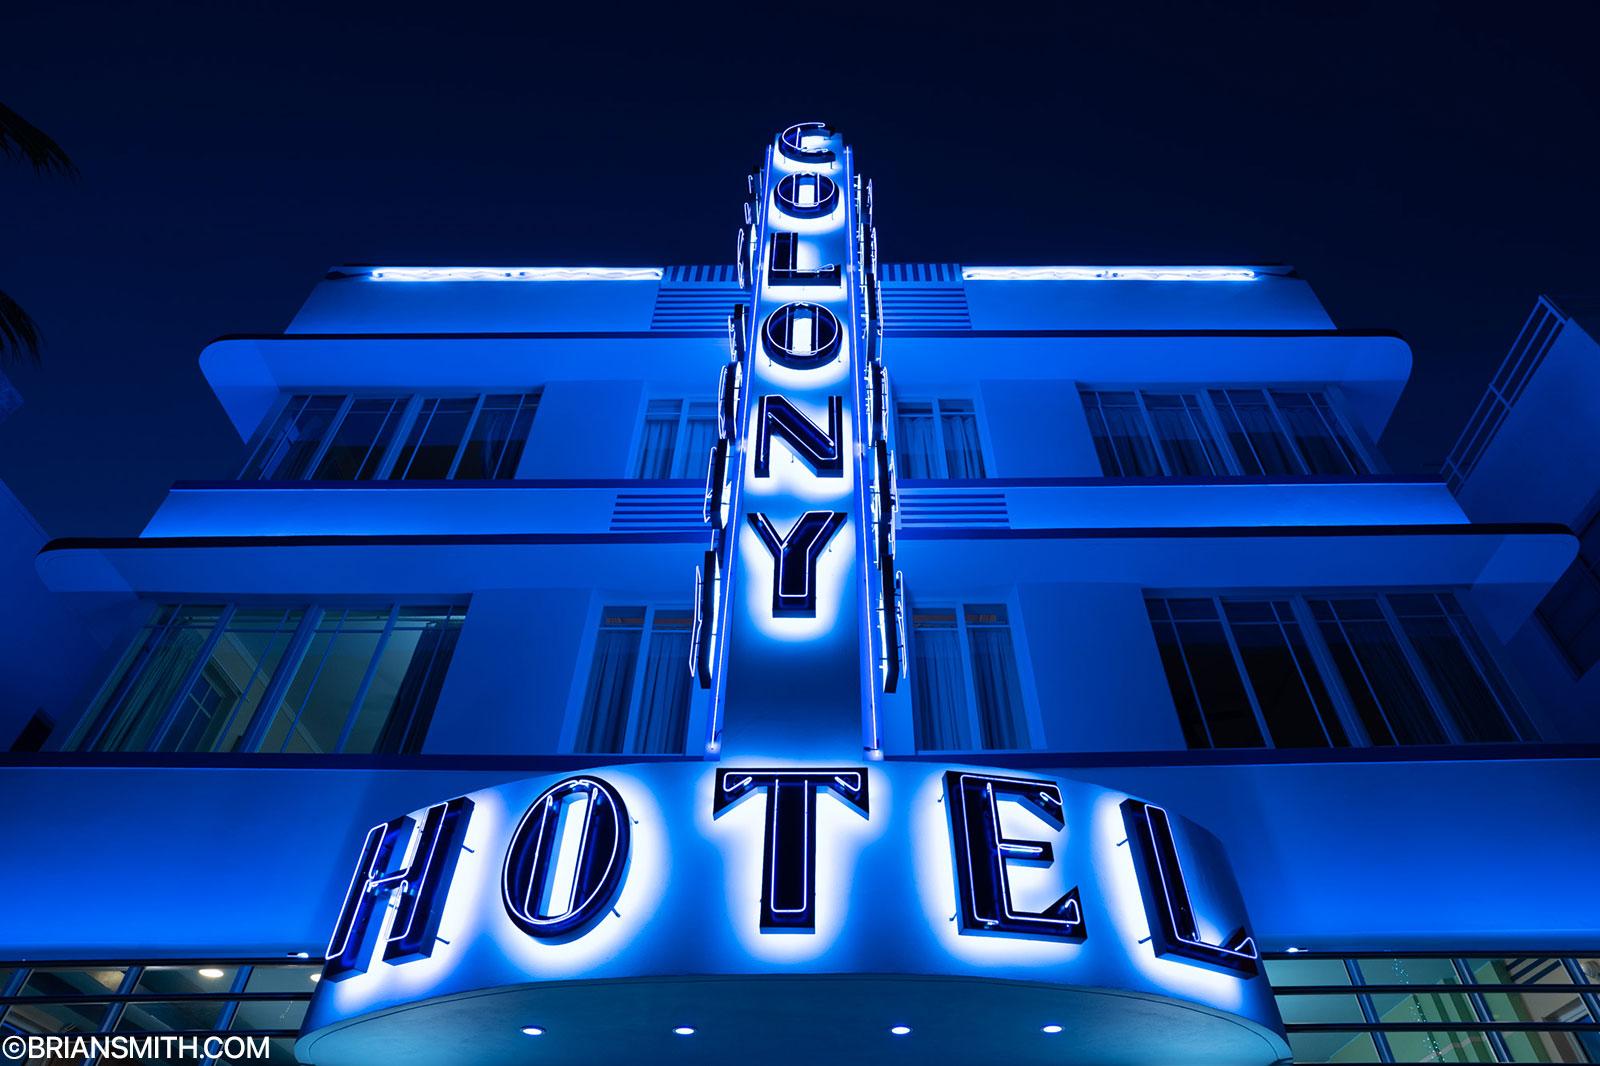 Sony FE 20mm F1.8 G Colony Hotel Miami Beach